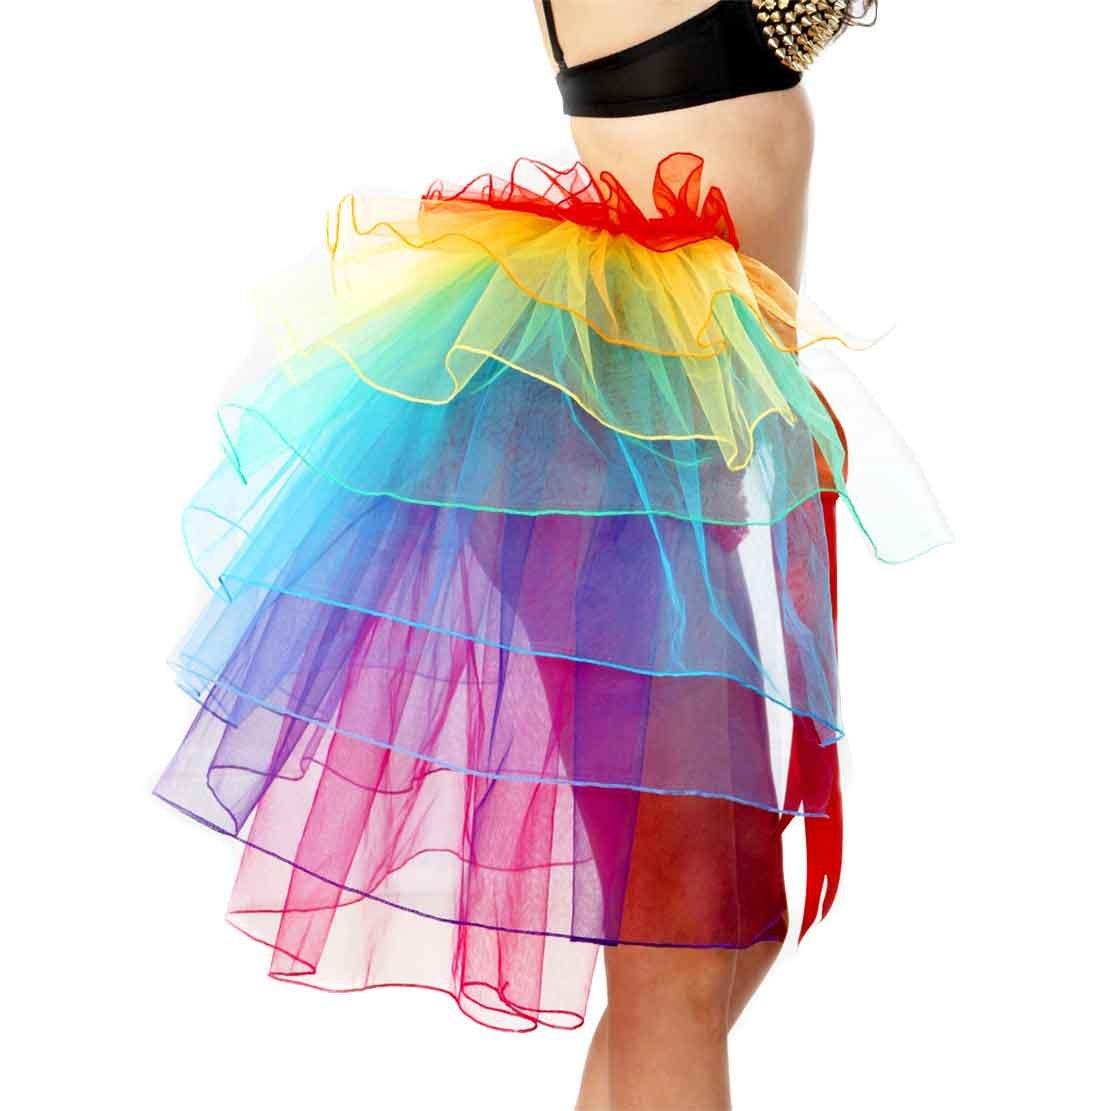 Women's Rainbow Wave Wig Long Gloves Socks 8Layered Tail Tutu Skirt Floral Headband Set (B) by ECOSCO (Image #3)